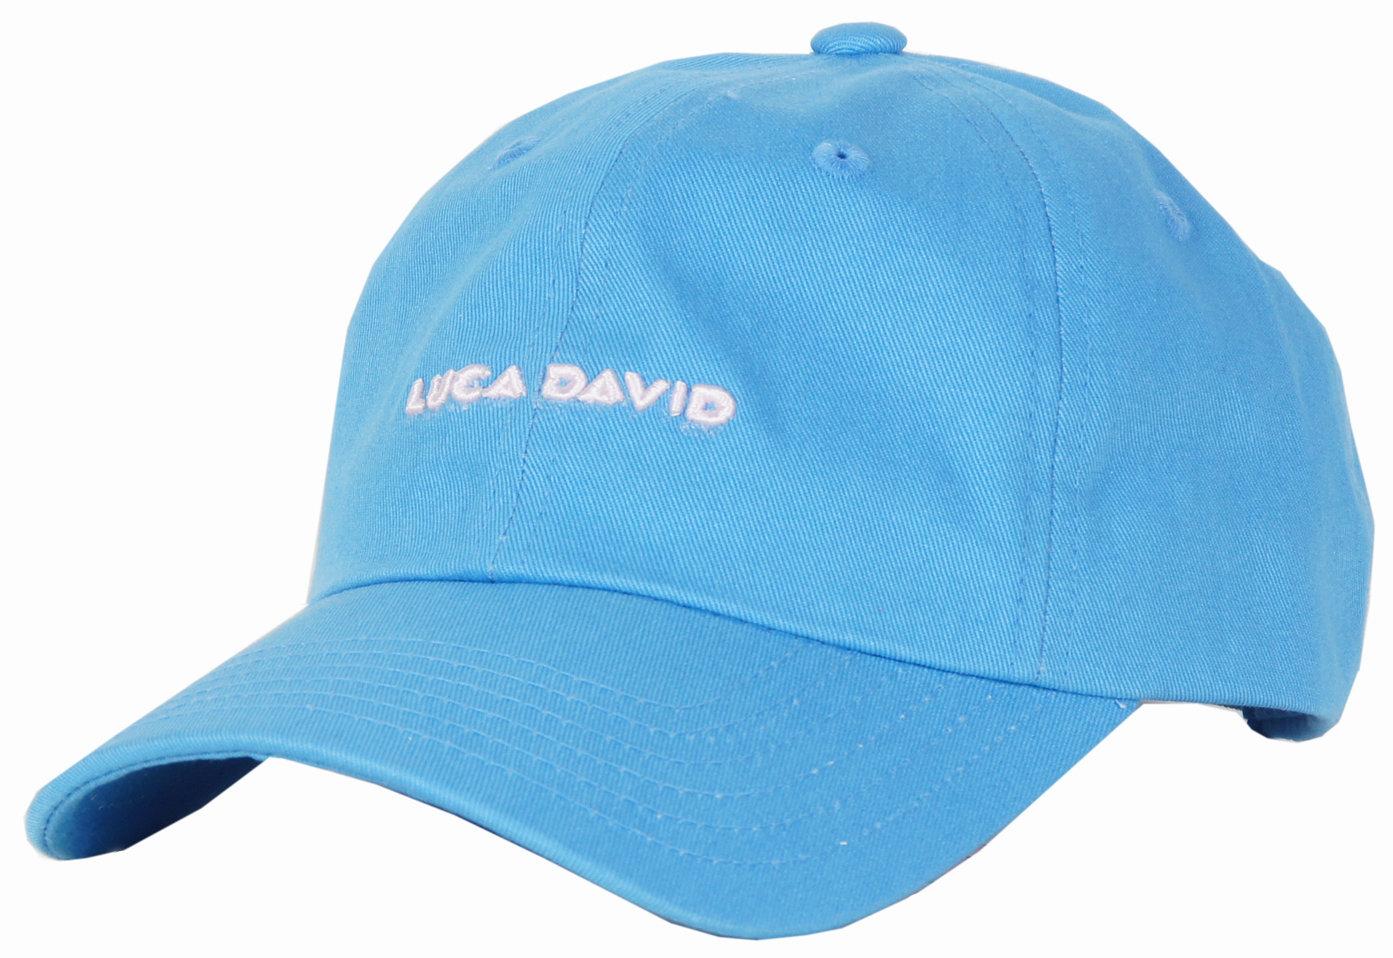 LUCA DAVID restricted Cap in Farbe denim blau